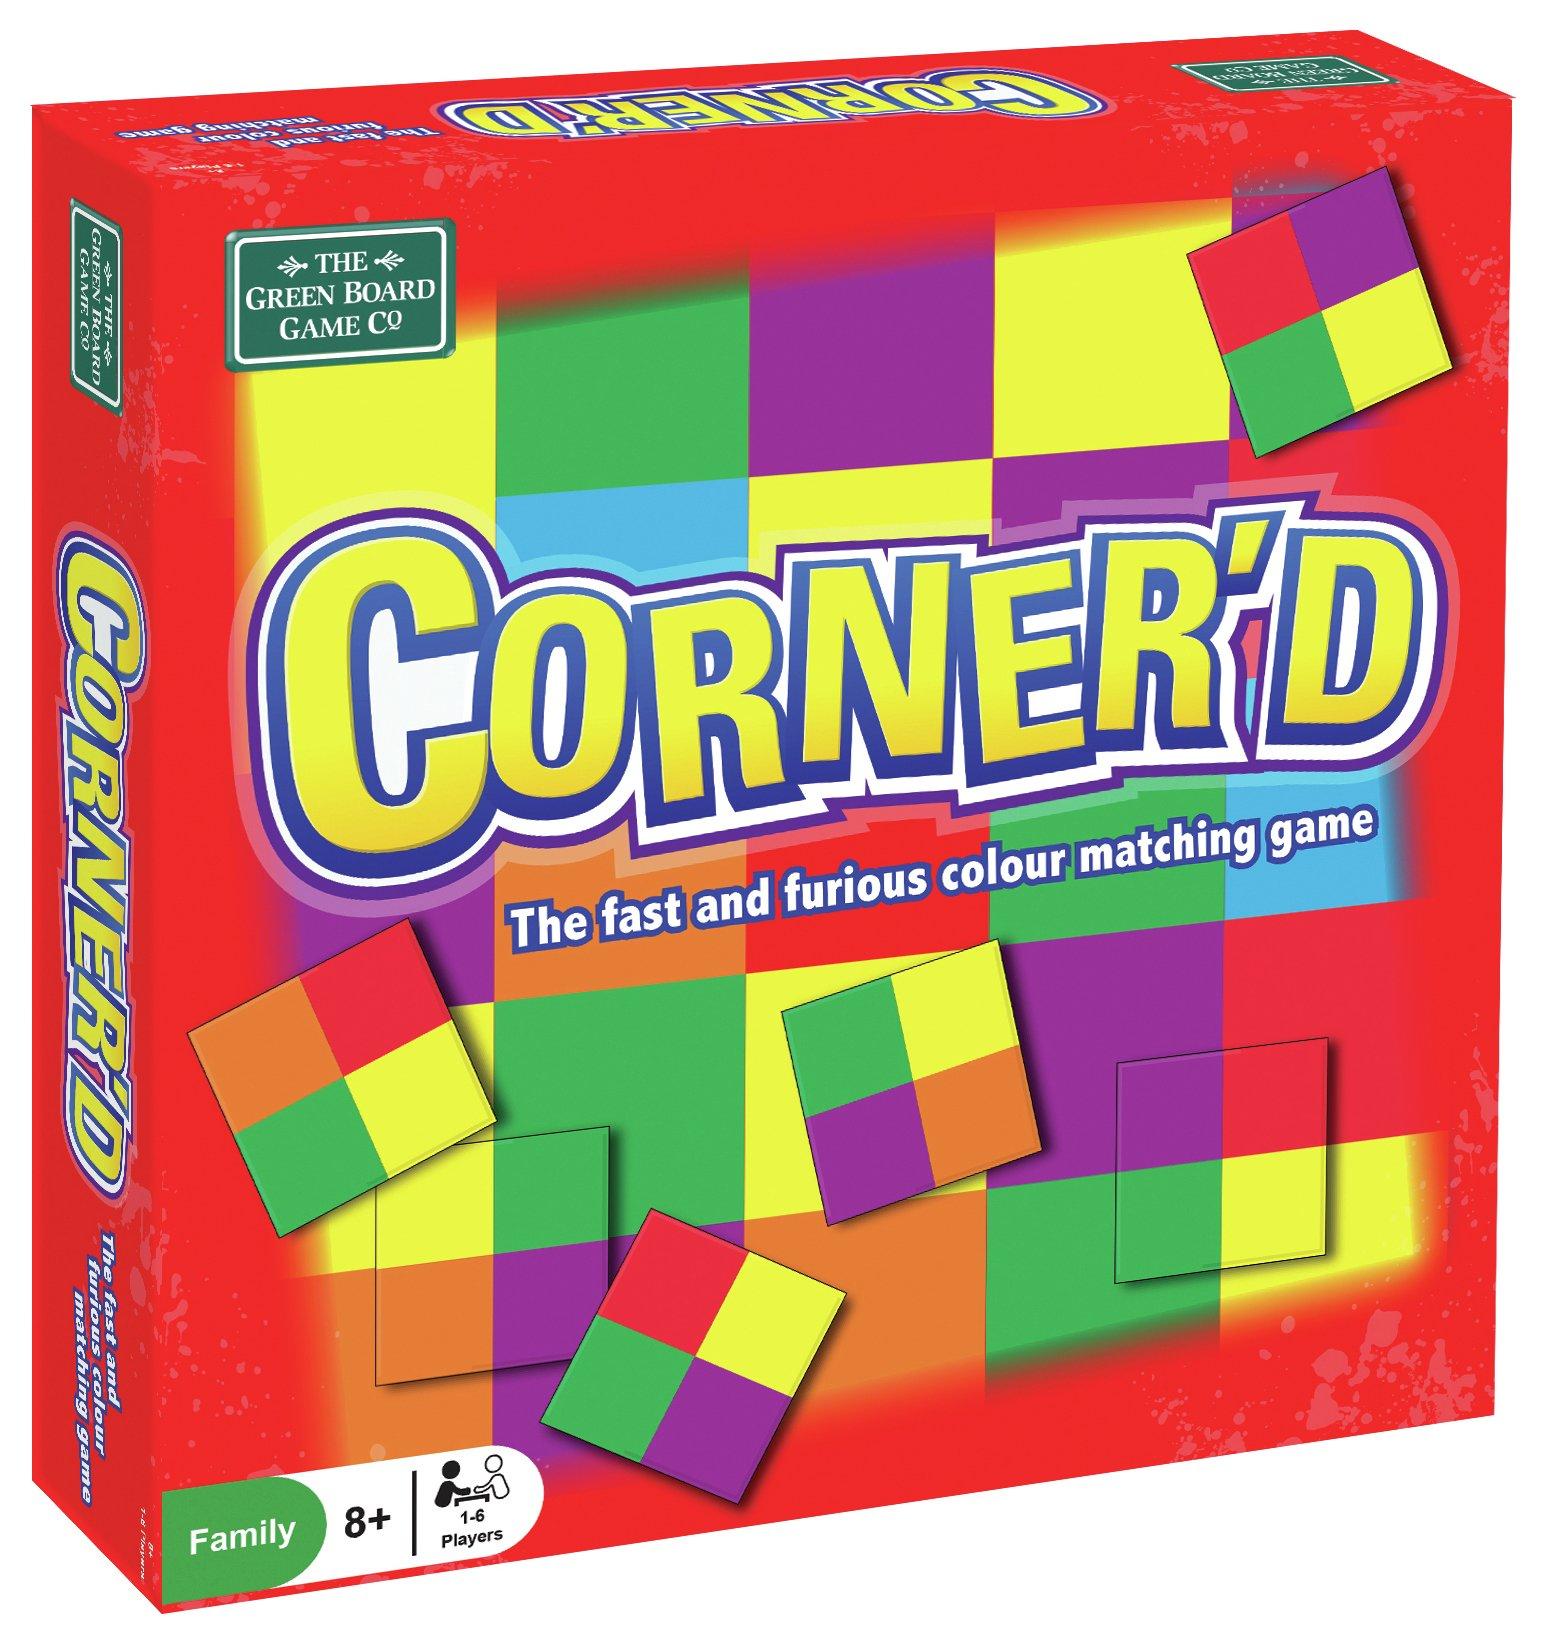 Image of Cornered Game.